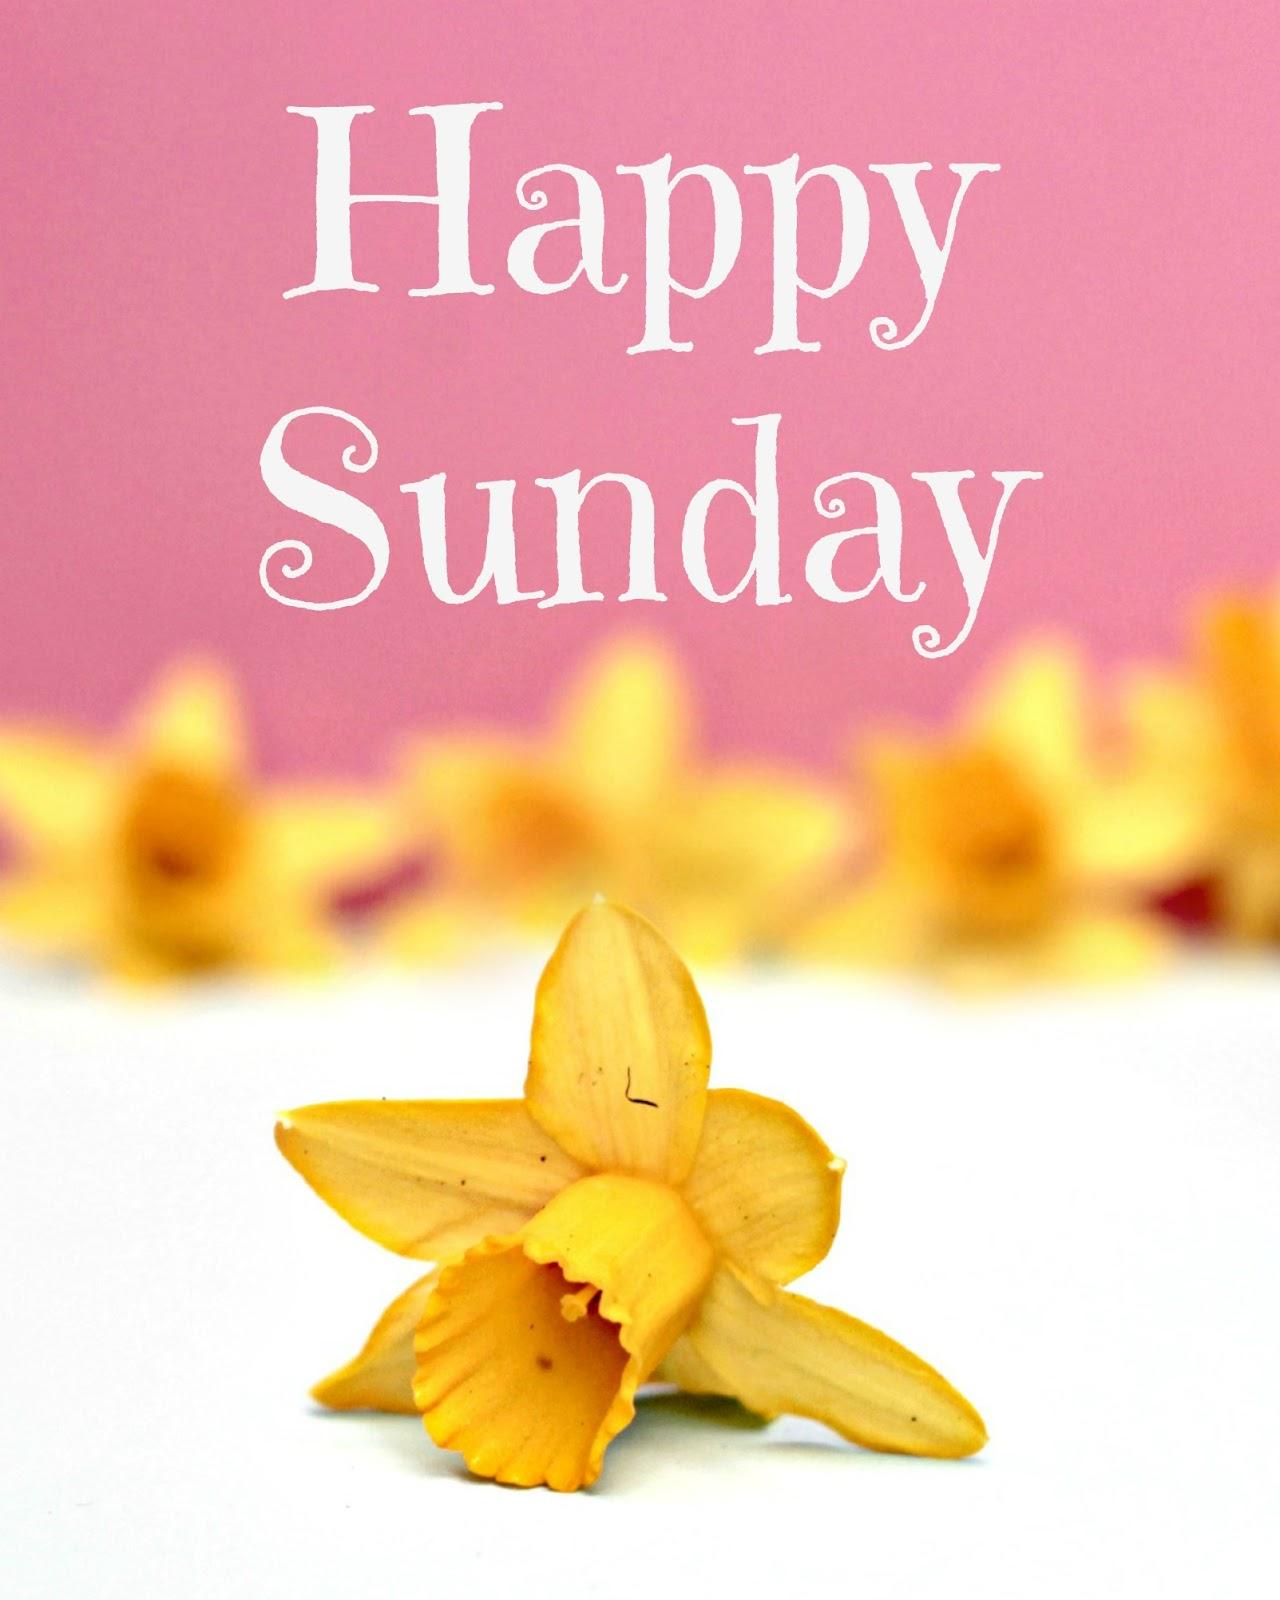 Happy sunday greeting cards m4hsunfo